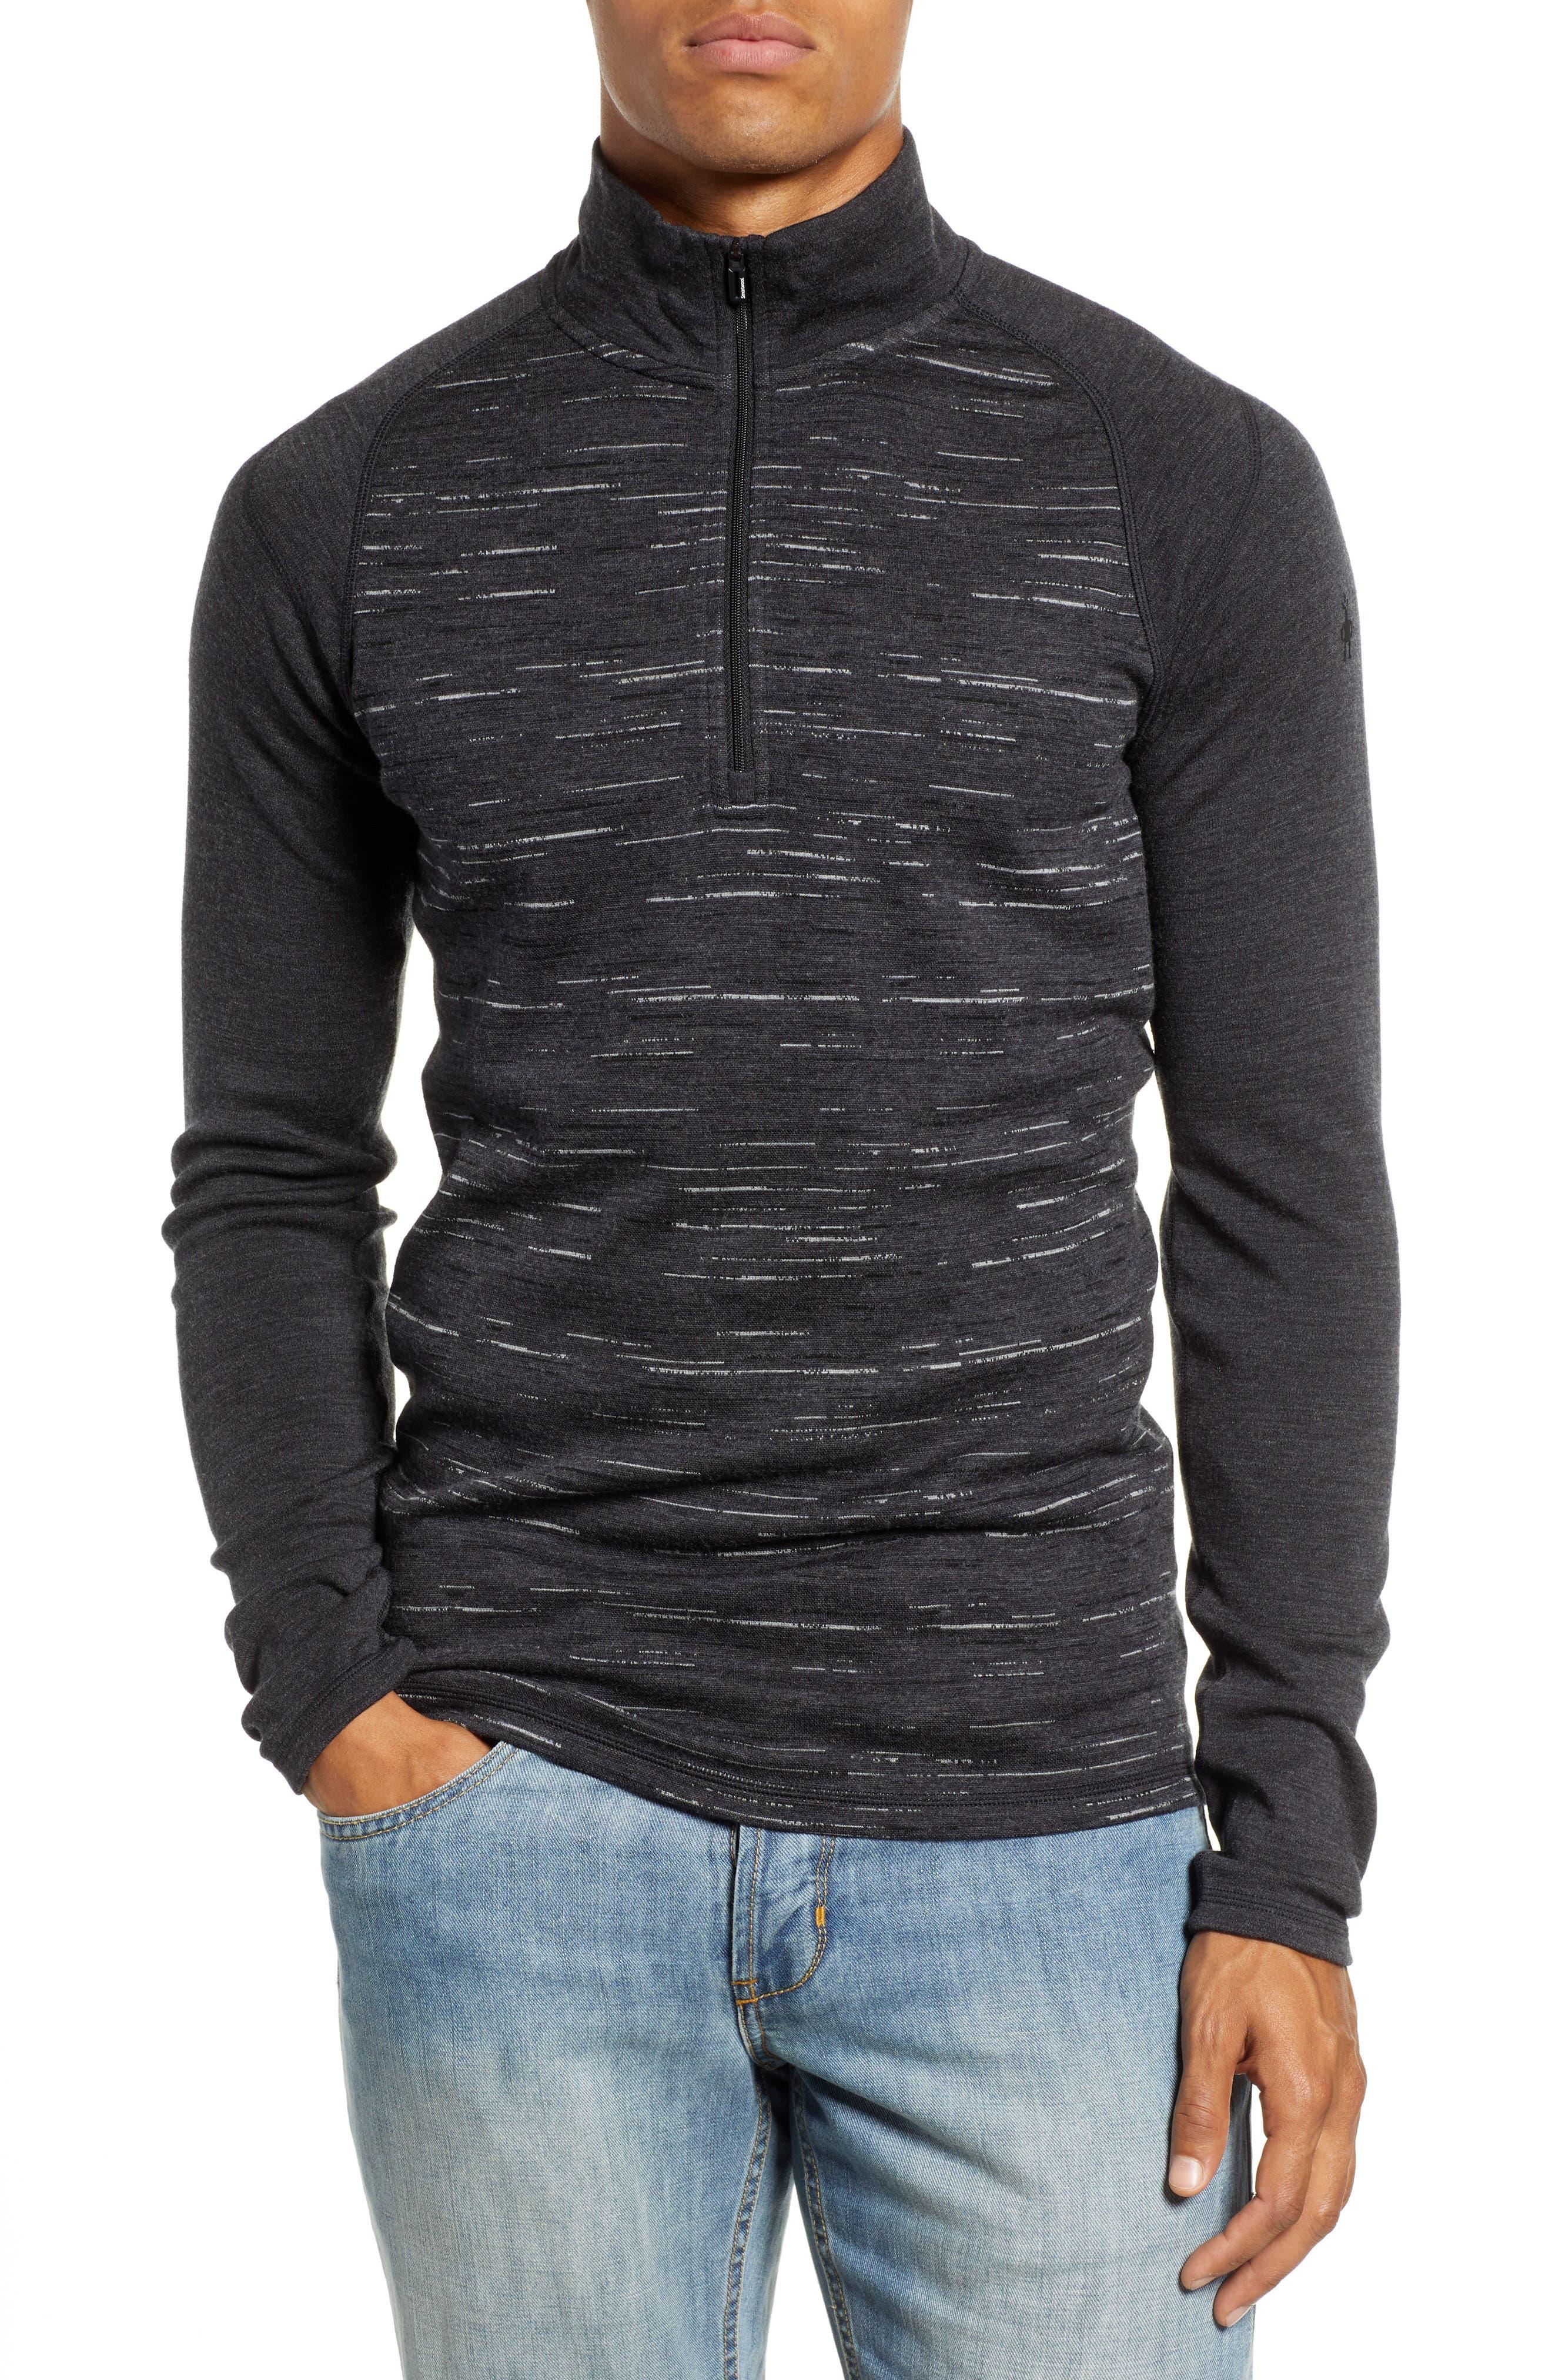 SMARTWOOL Merino 250 Base Layer Pattern Quarter Zip Pullover, Main, color, CHARCOAL/ BLACK